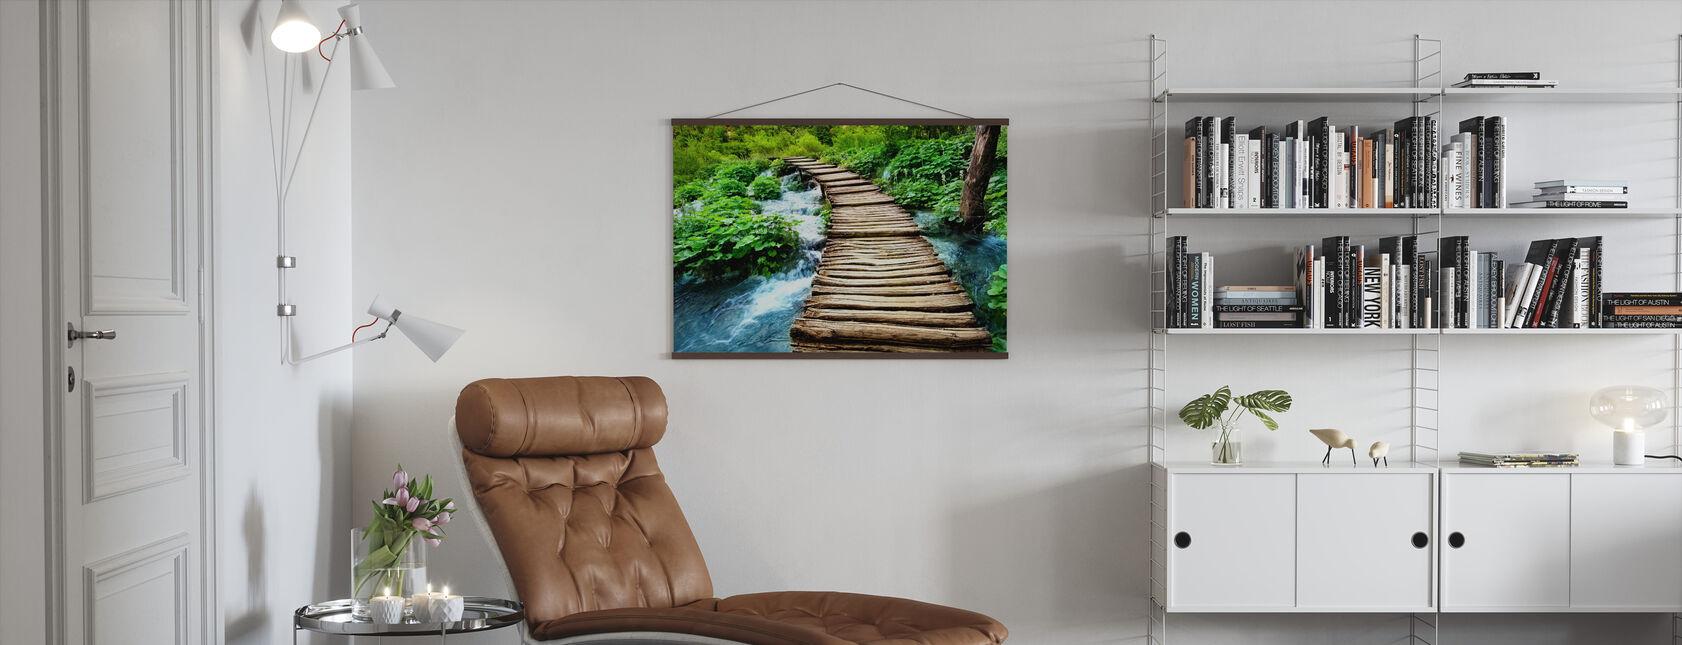 Boardwalk - Poster - Living Room